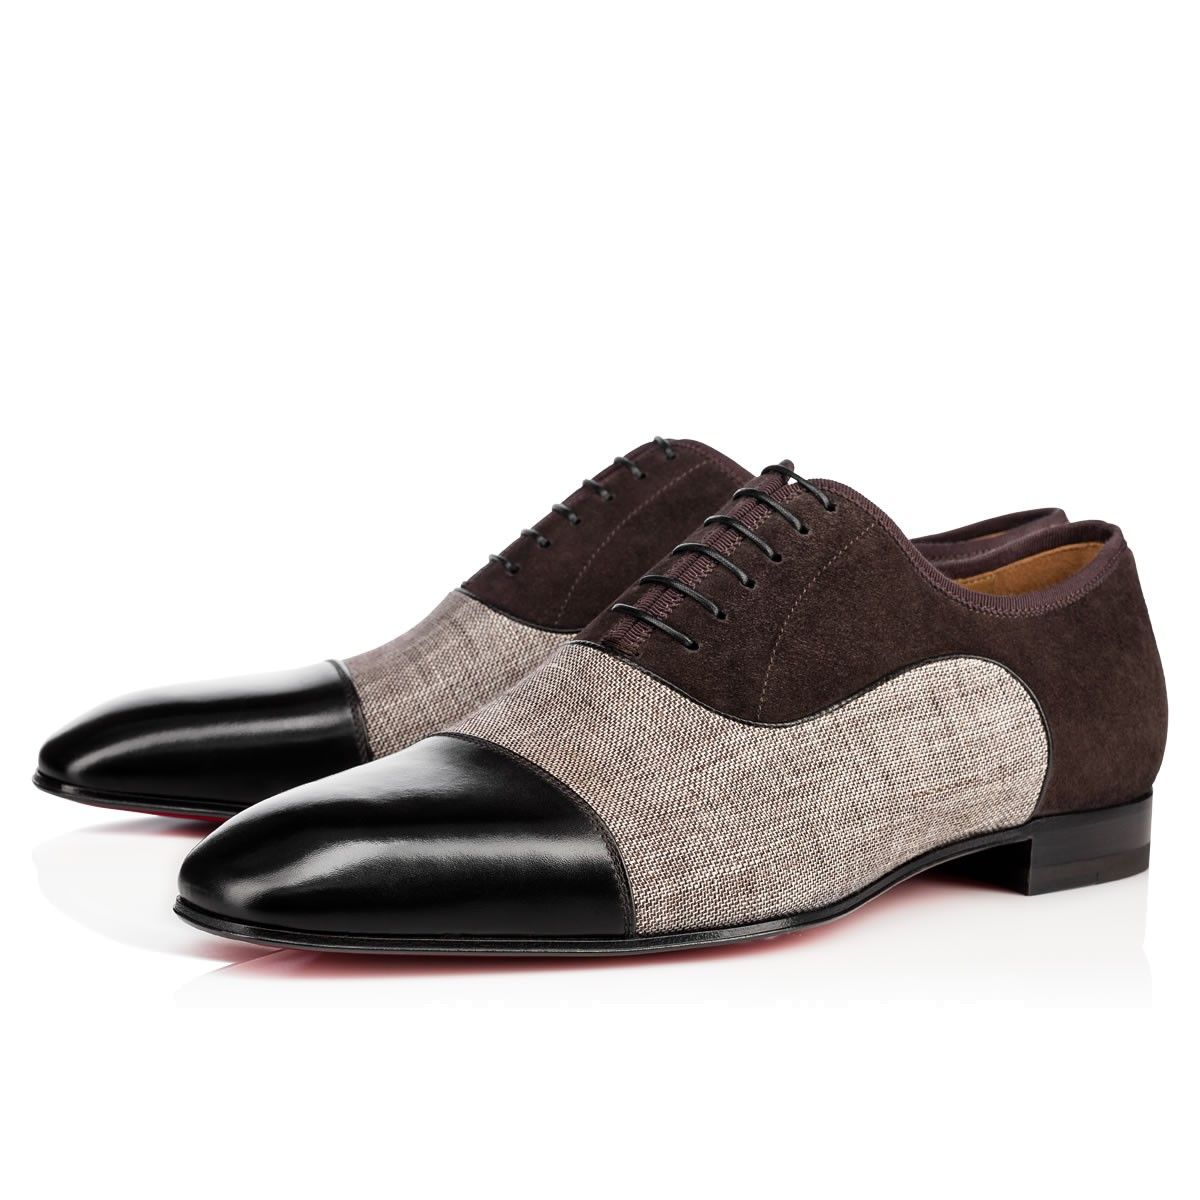 8138db808700 CHRISTIAN LOUBOUTIN Greggo Orlato Flat Version Black Leather - Men Shoes - Christian  Louboutin.  christianlouboutin  shoes